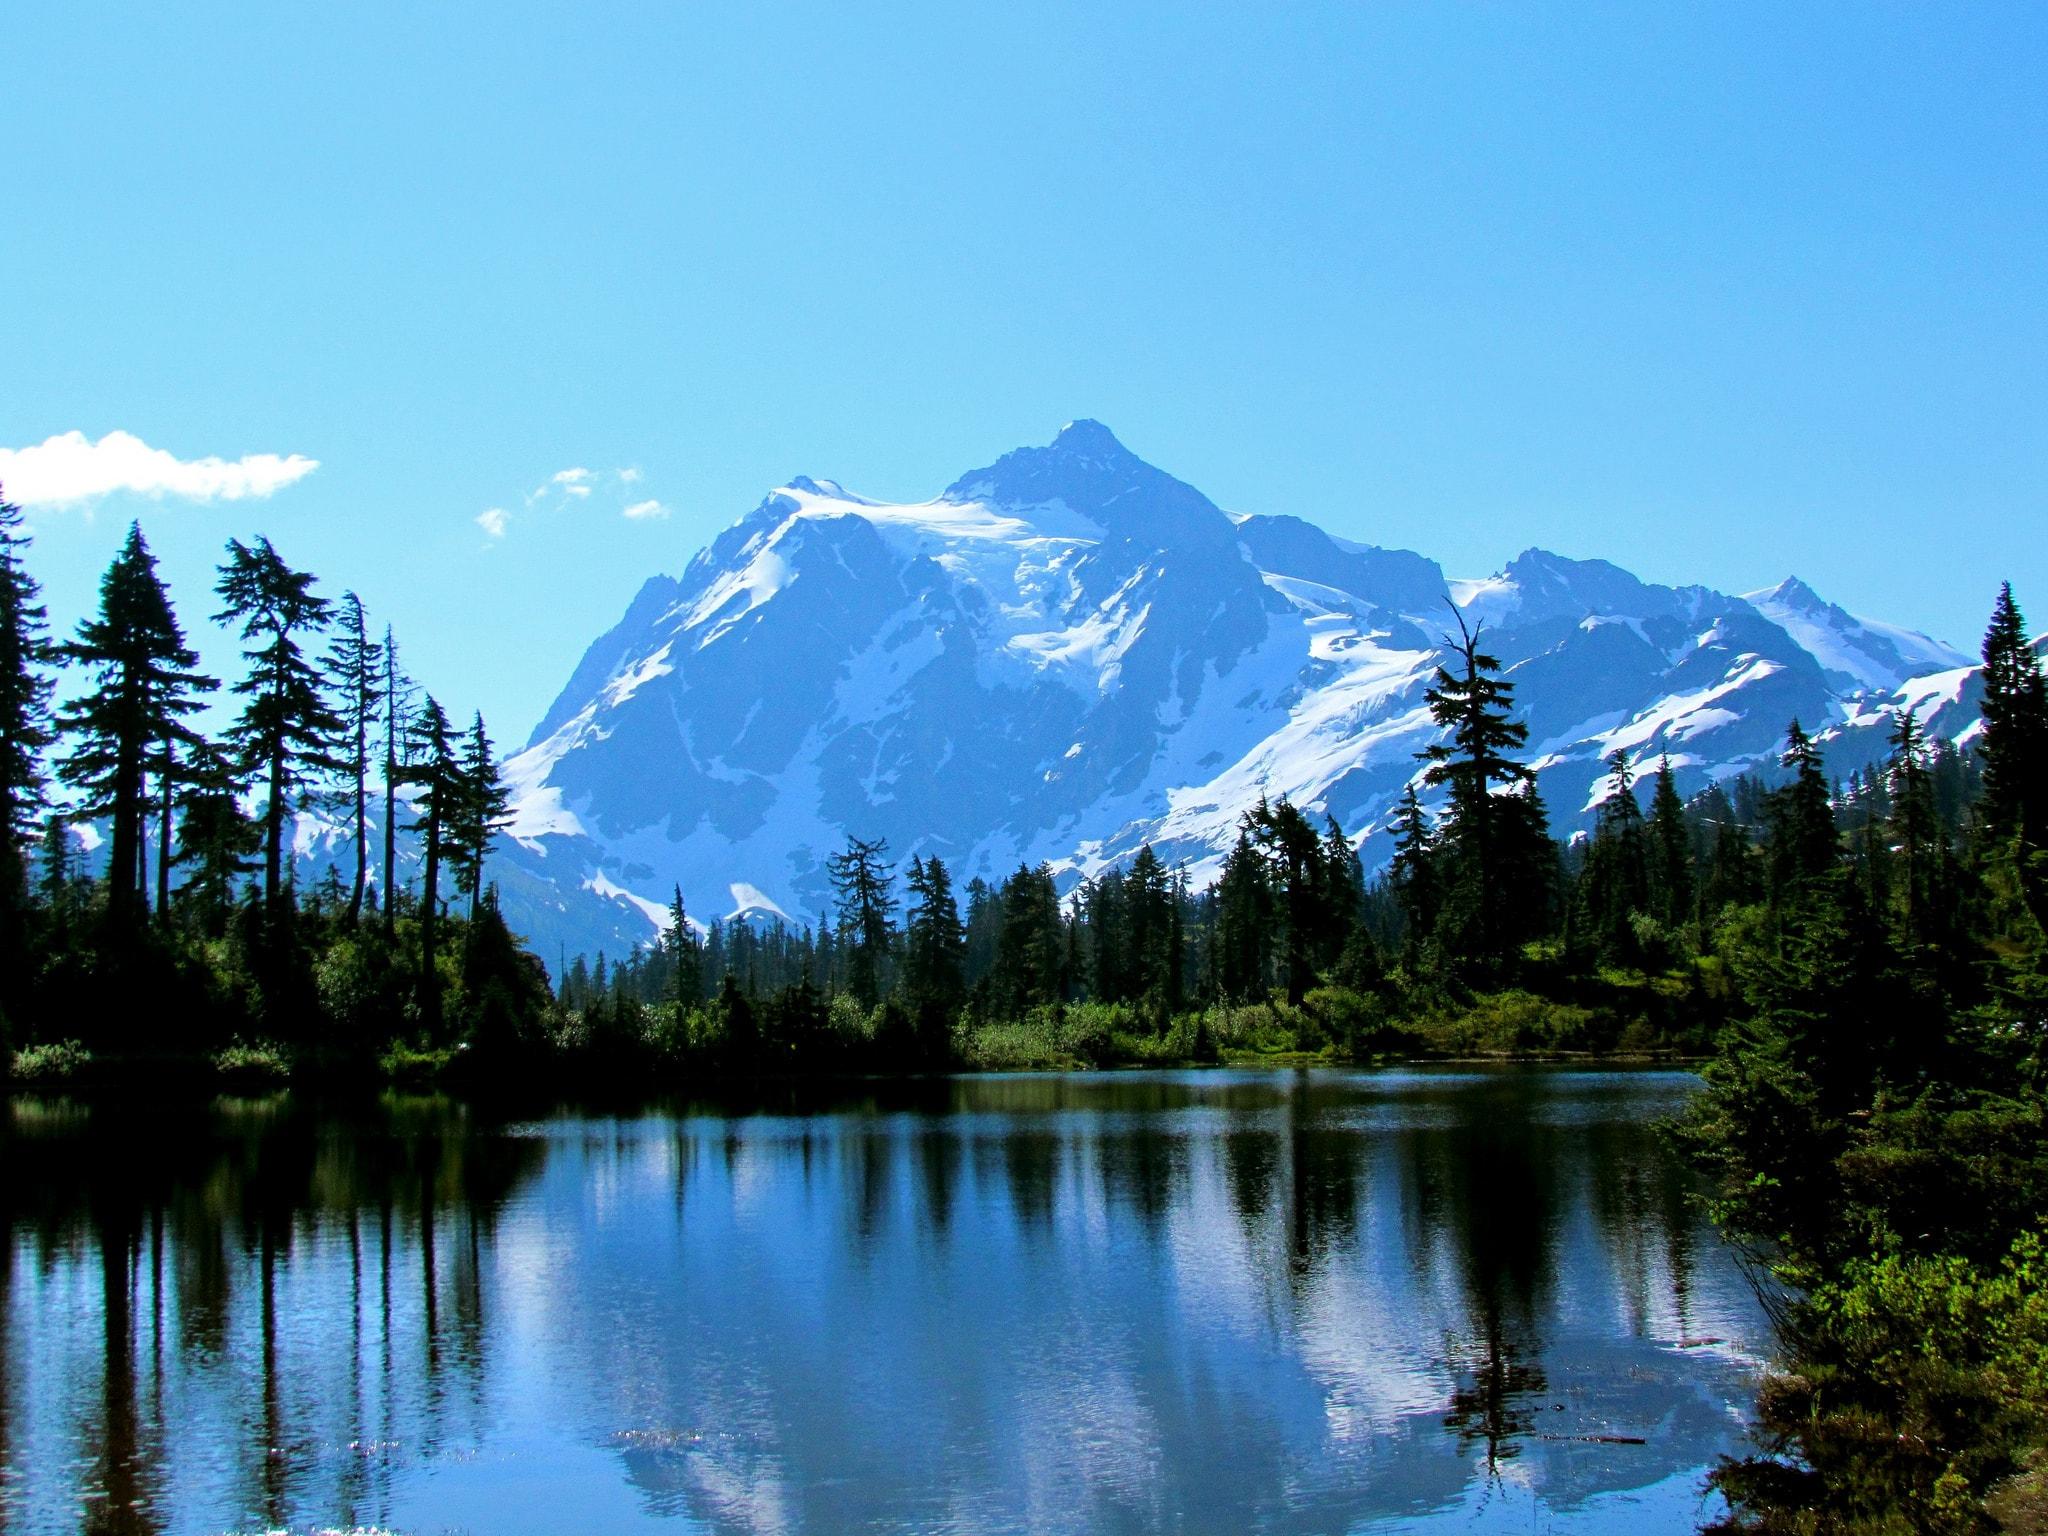 Mt. Baker-Snoqualmie National Forest | © Jeff Gunn / Flickr